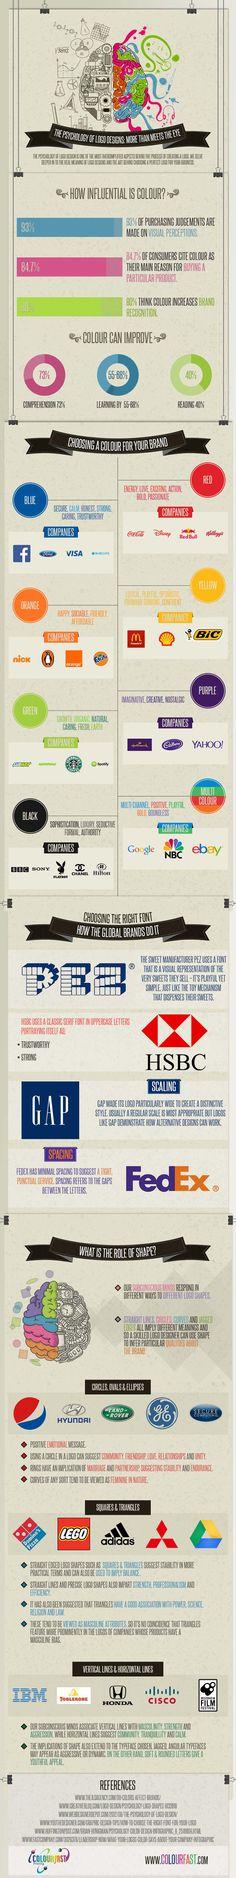 Infografik – The Psychology Of Logo Designs by Colourfast  http://onlinemarketing.de/news/infografik-wiedererkennung-psychologie-logo-design/infografik-the-psychology-of-logo-designs-by-colourfast